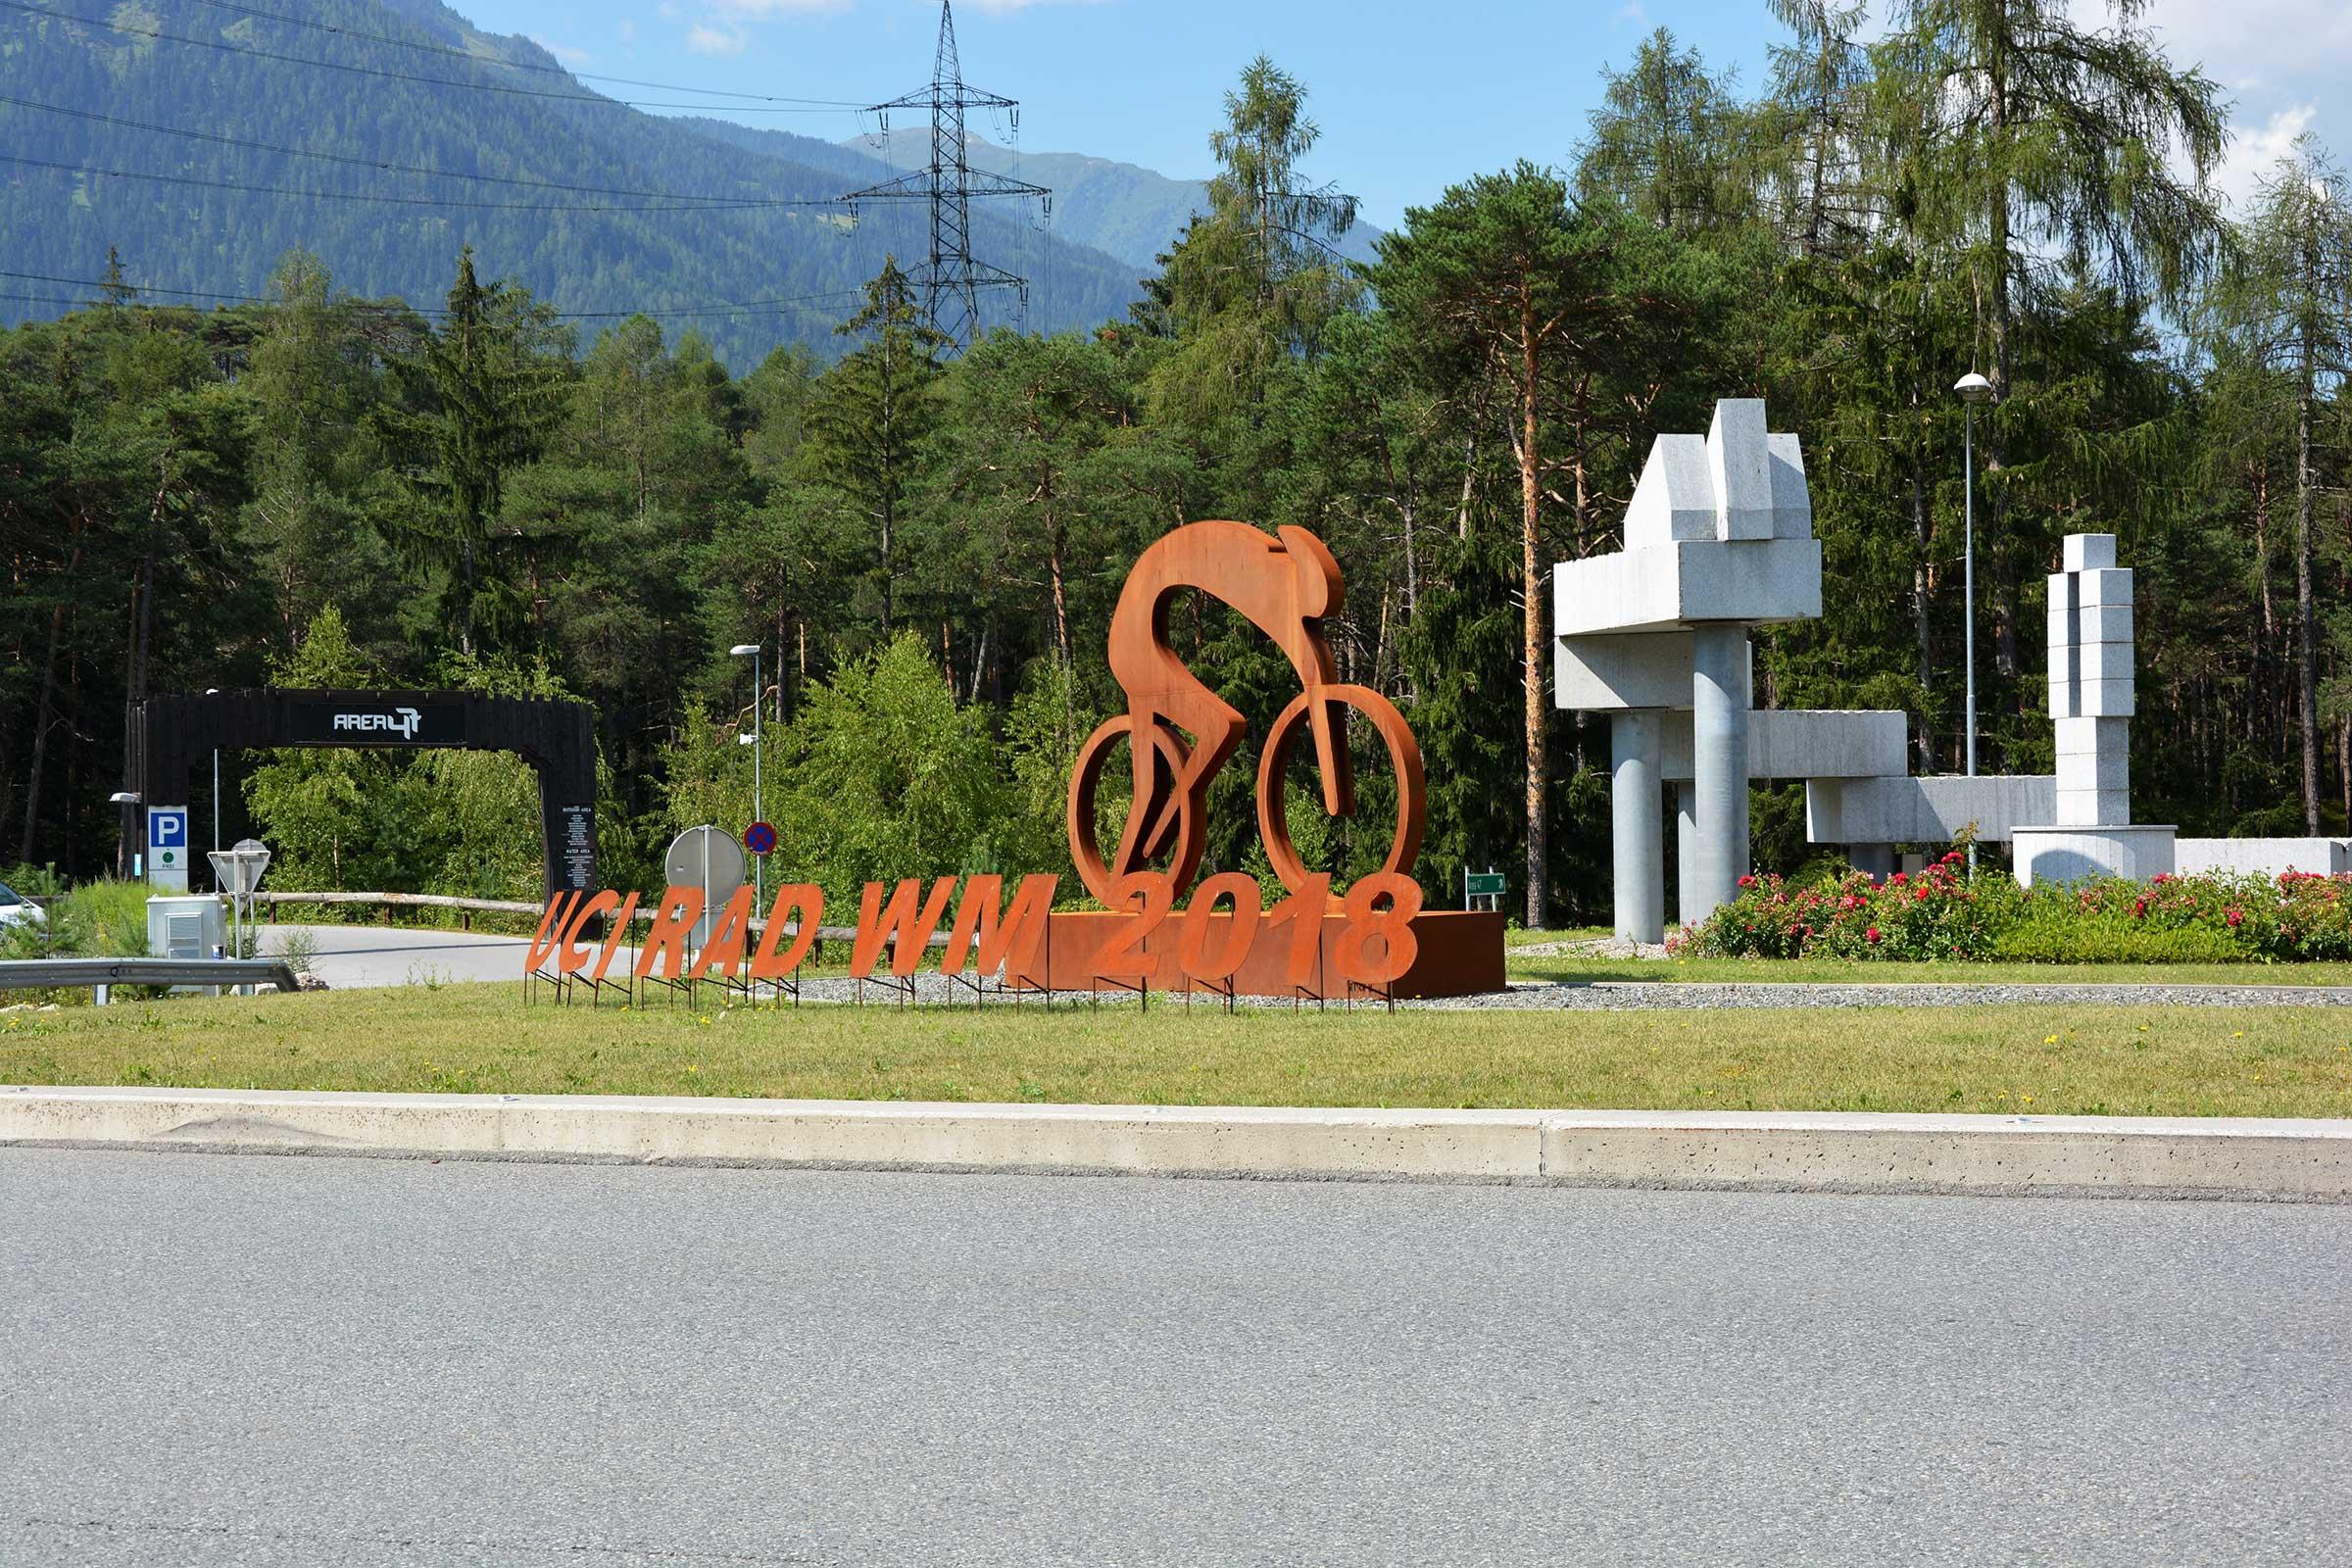 Kreisverkehr Ötztaler-Höhe - Rad-Weltmeisterschaft Ötztal